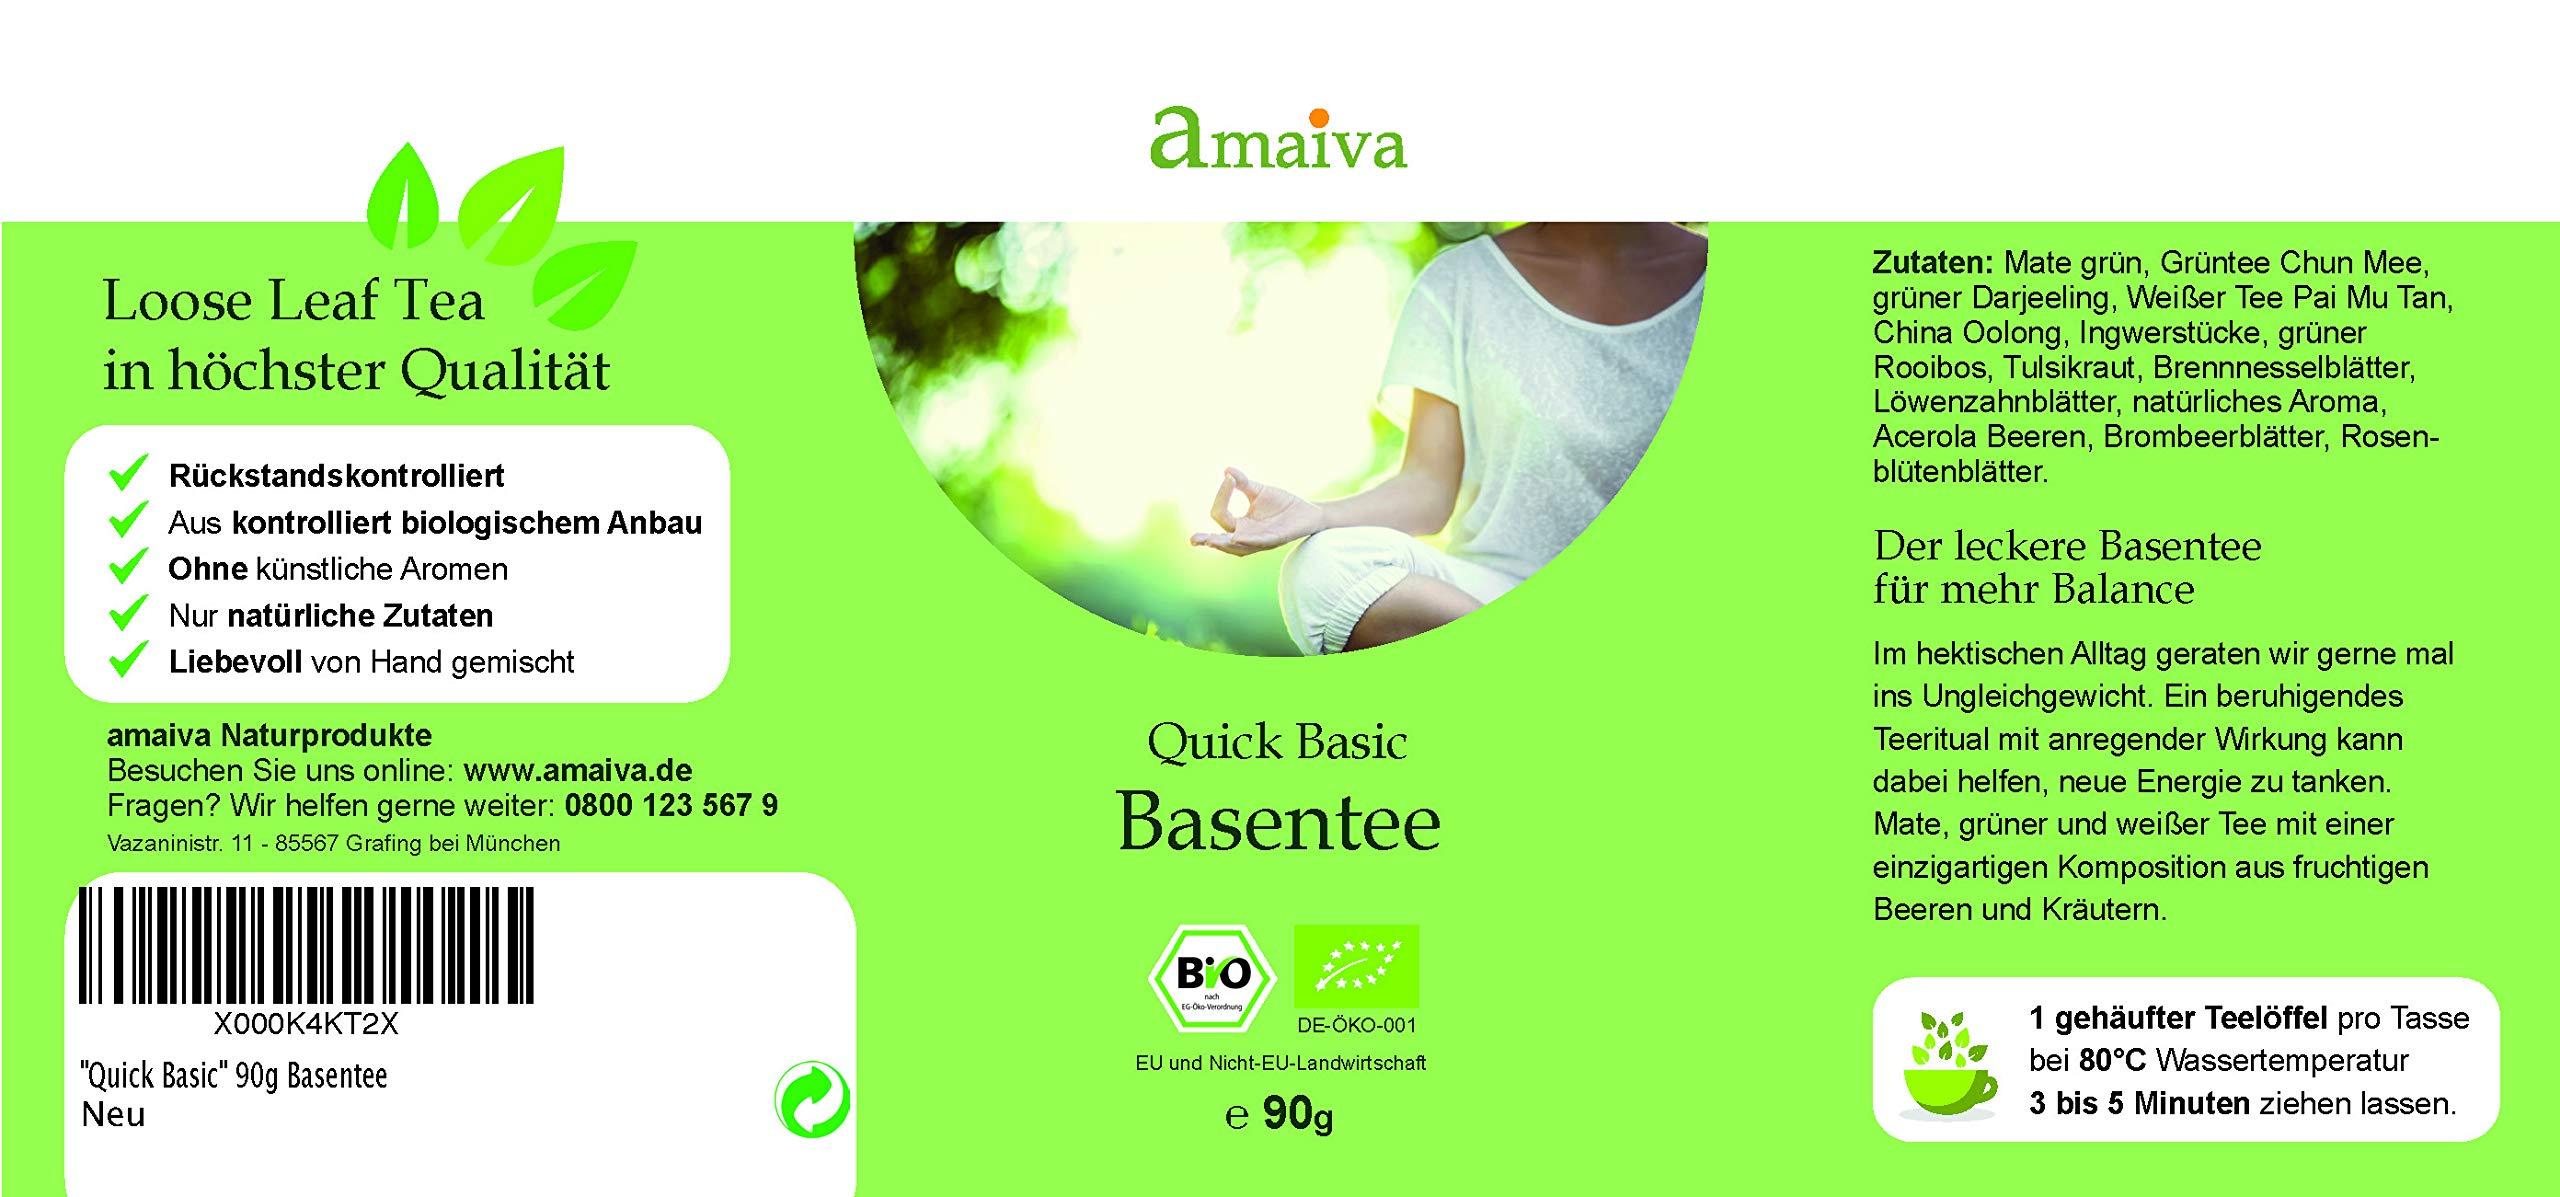 Quick-Basic-Basentee-Bio